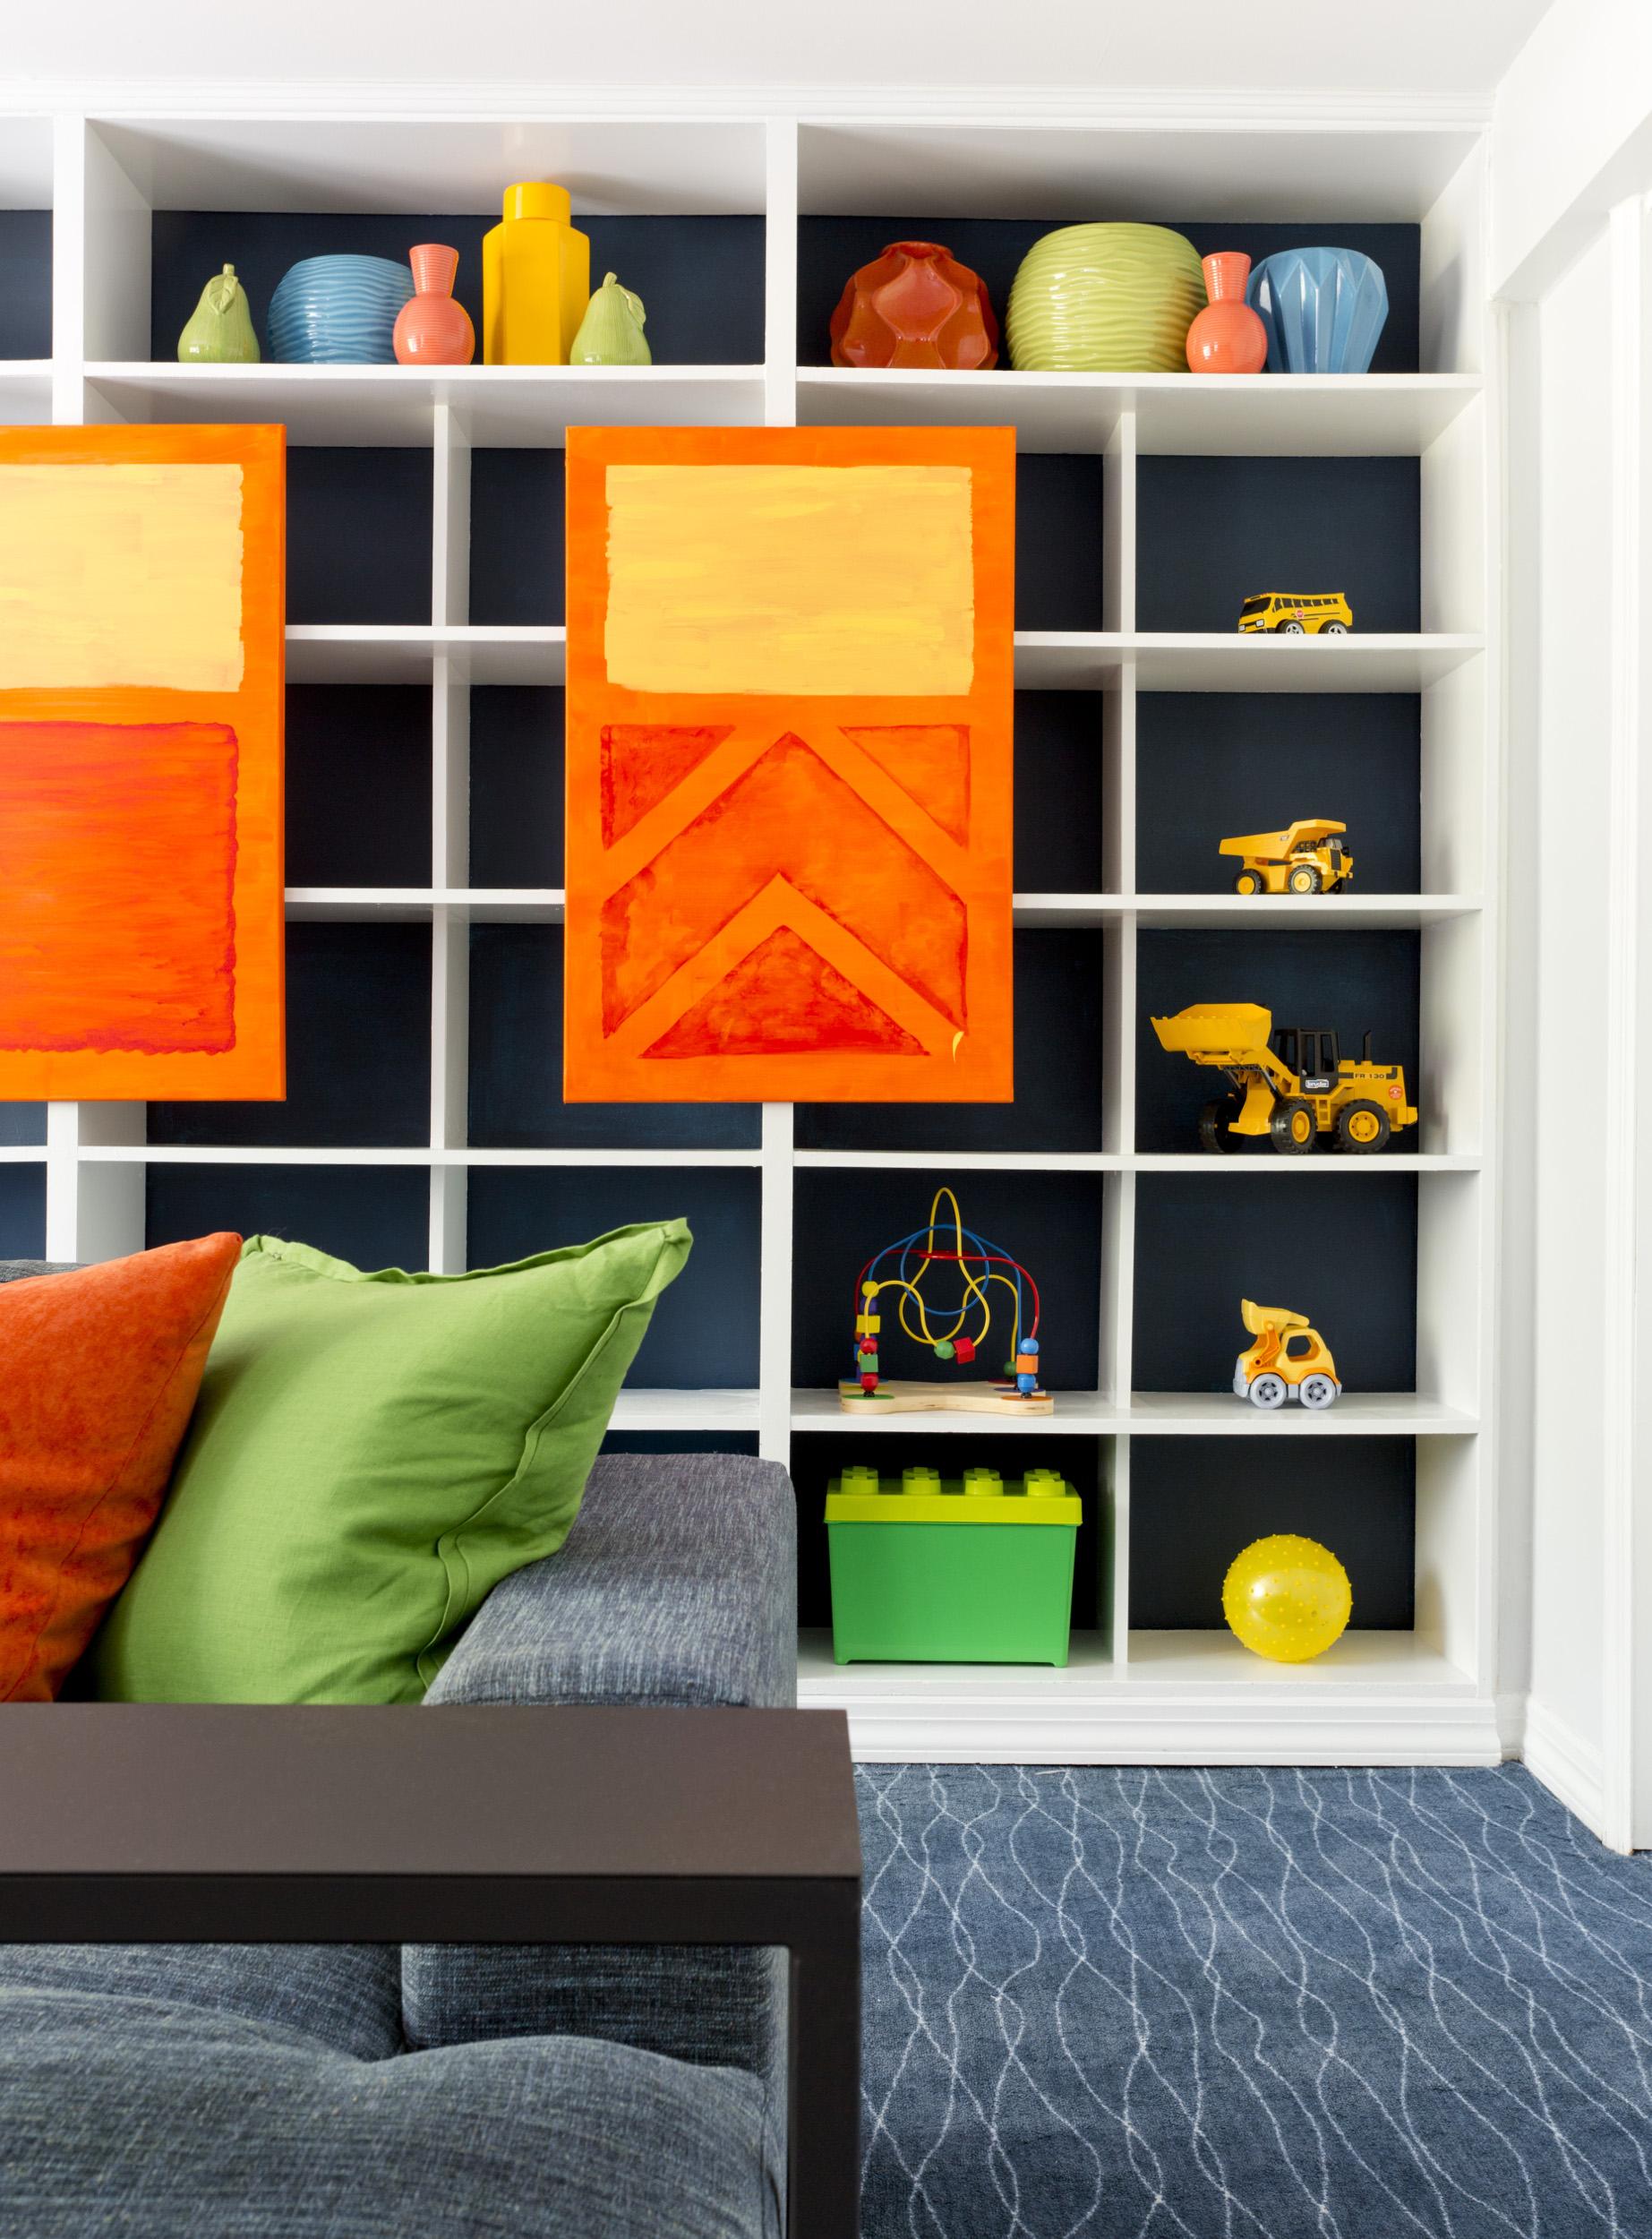 Kids Toy Room Decoration Ideas Caroline Kopp.jpg